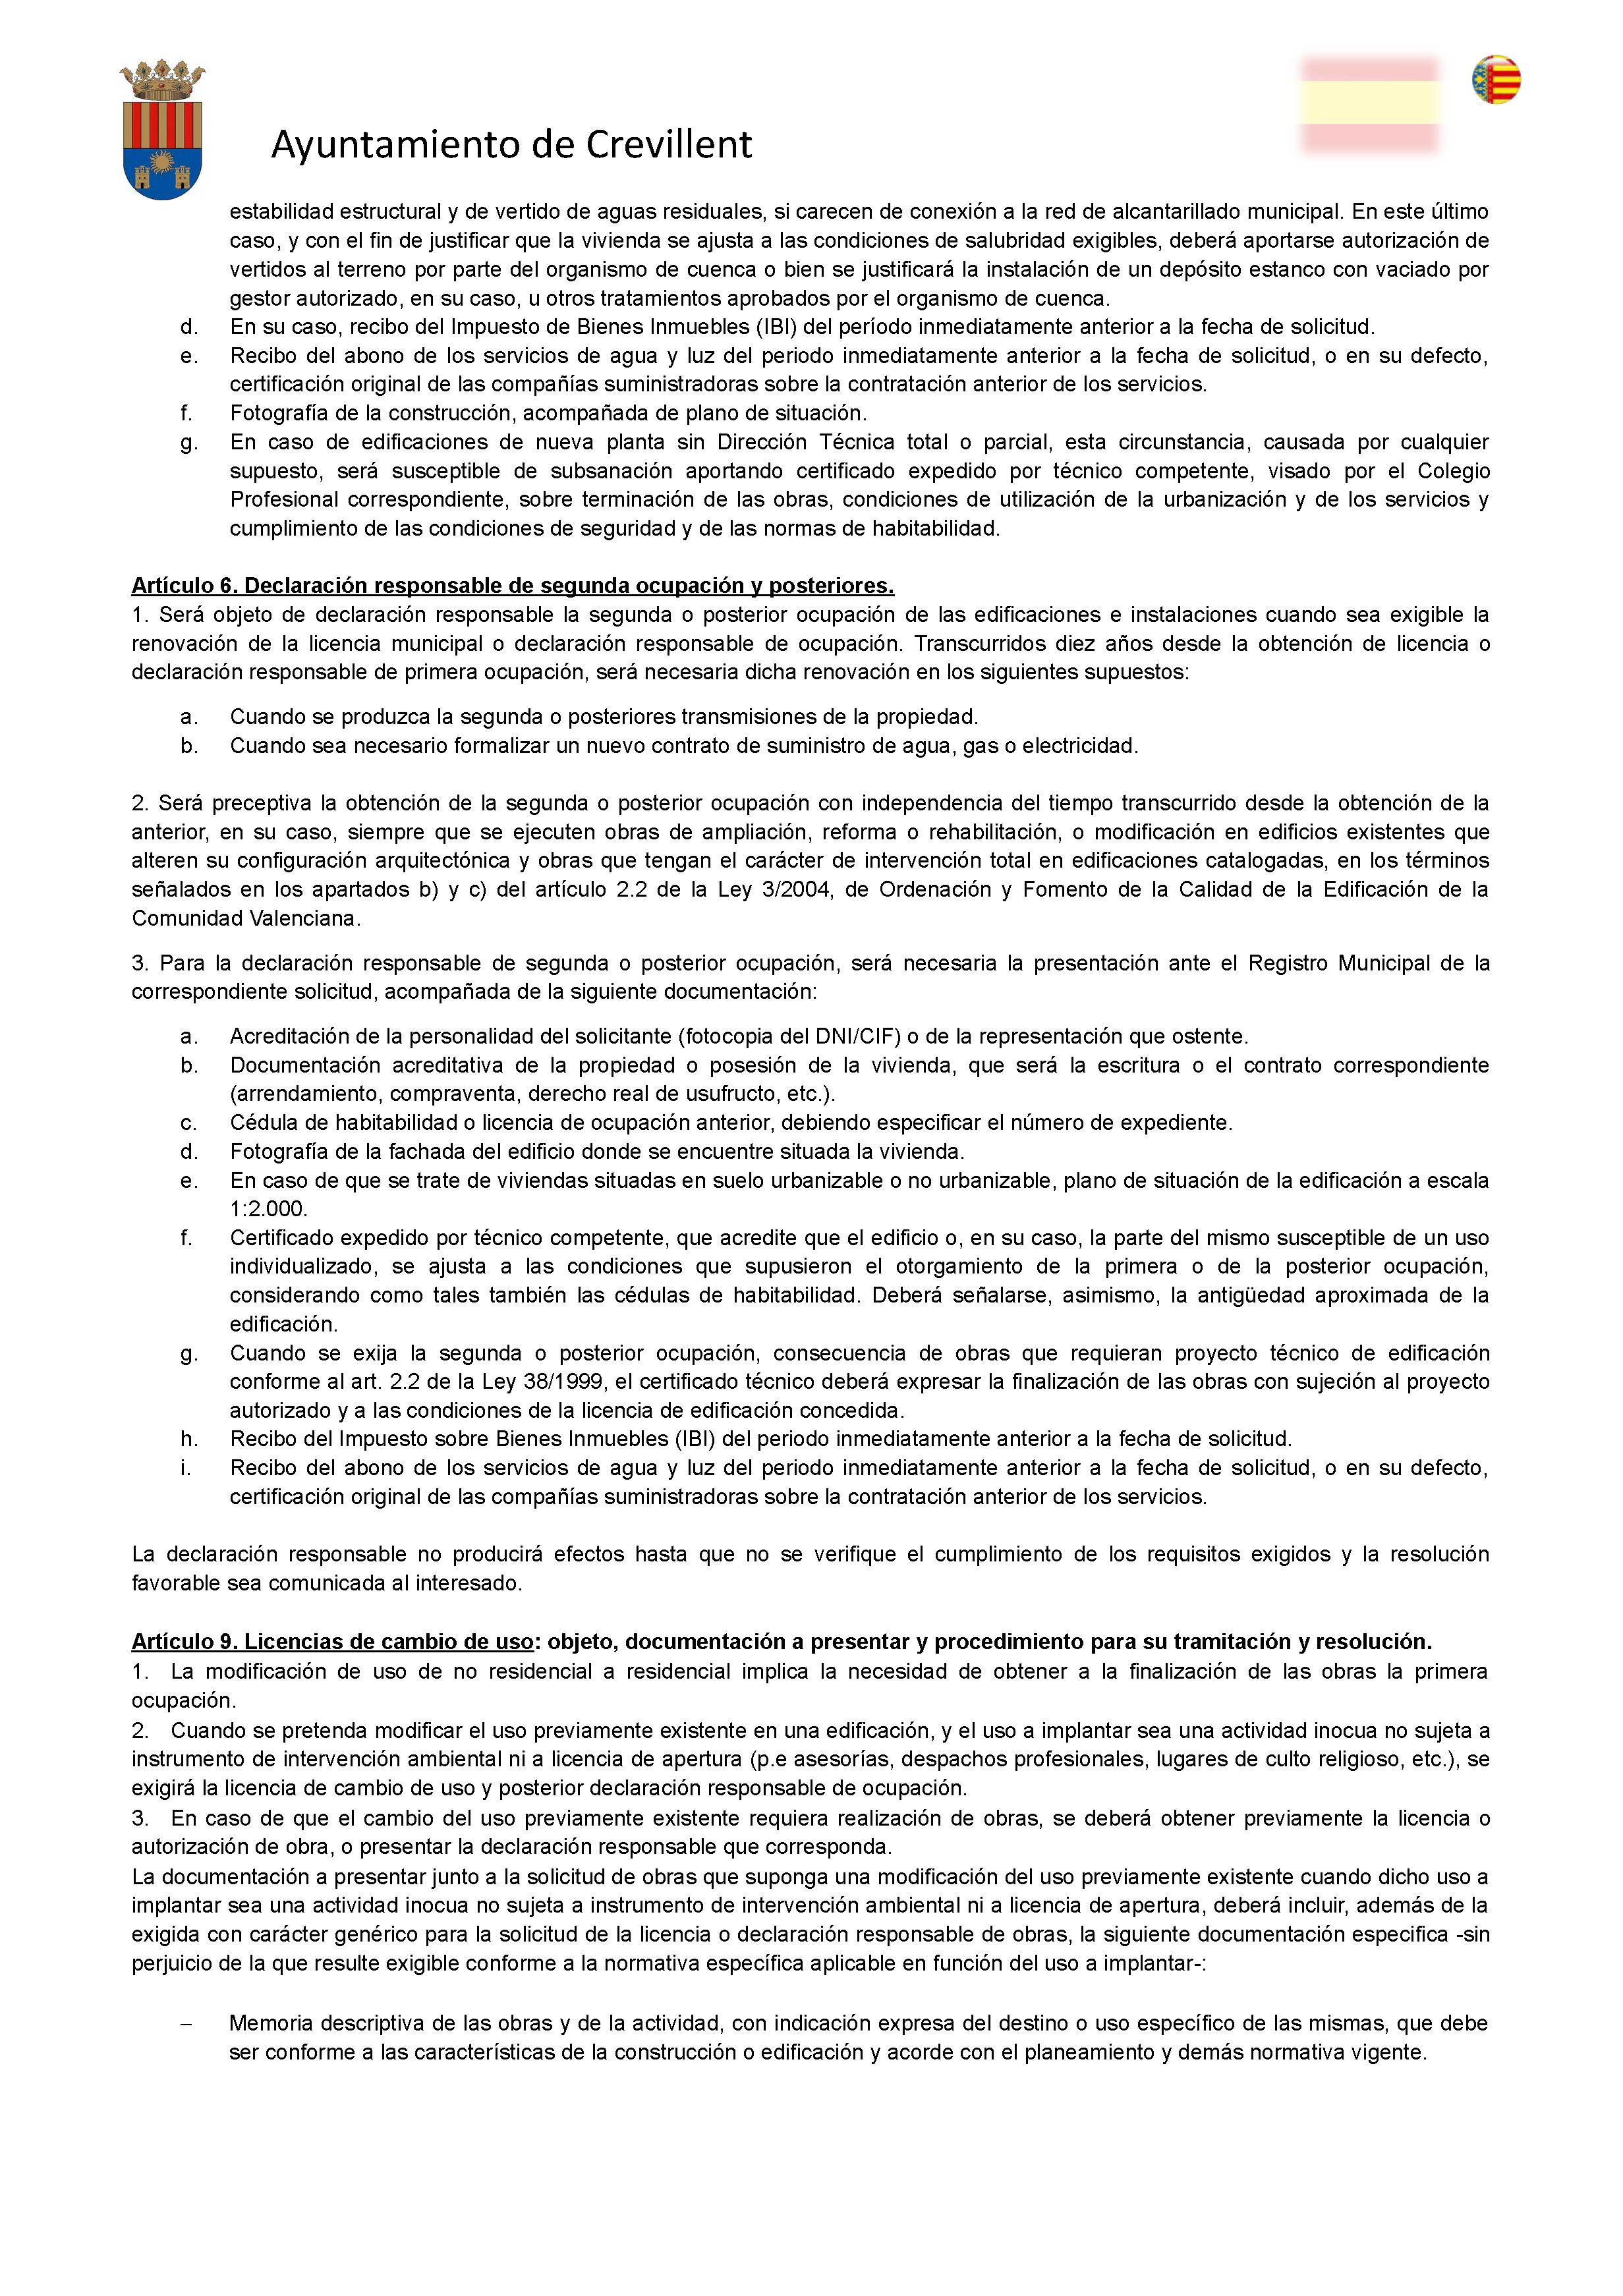 Impreso Declaración Responsable Segunda Ocupación Crevillente/Crevillent